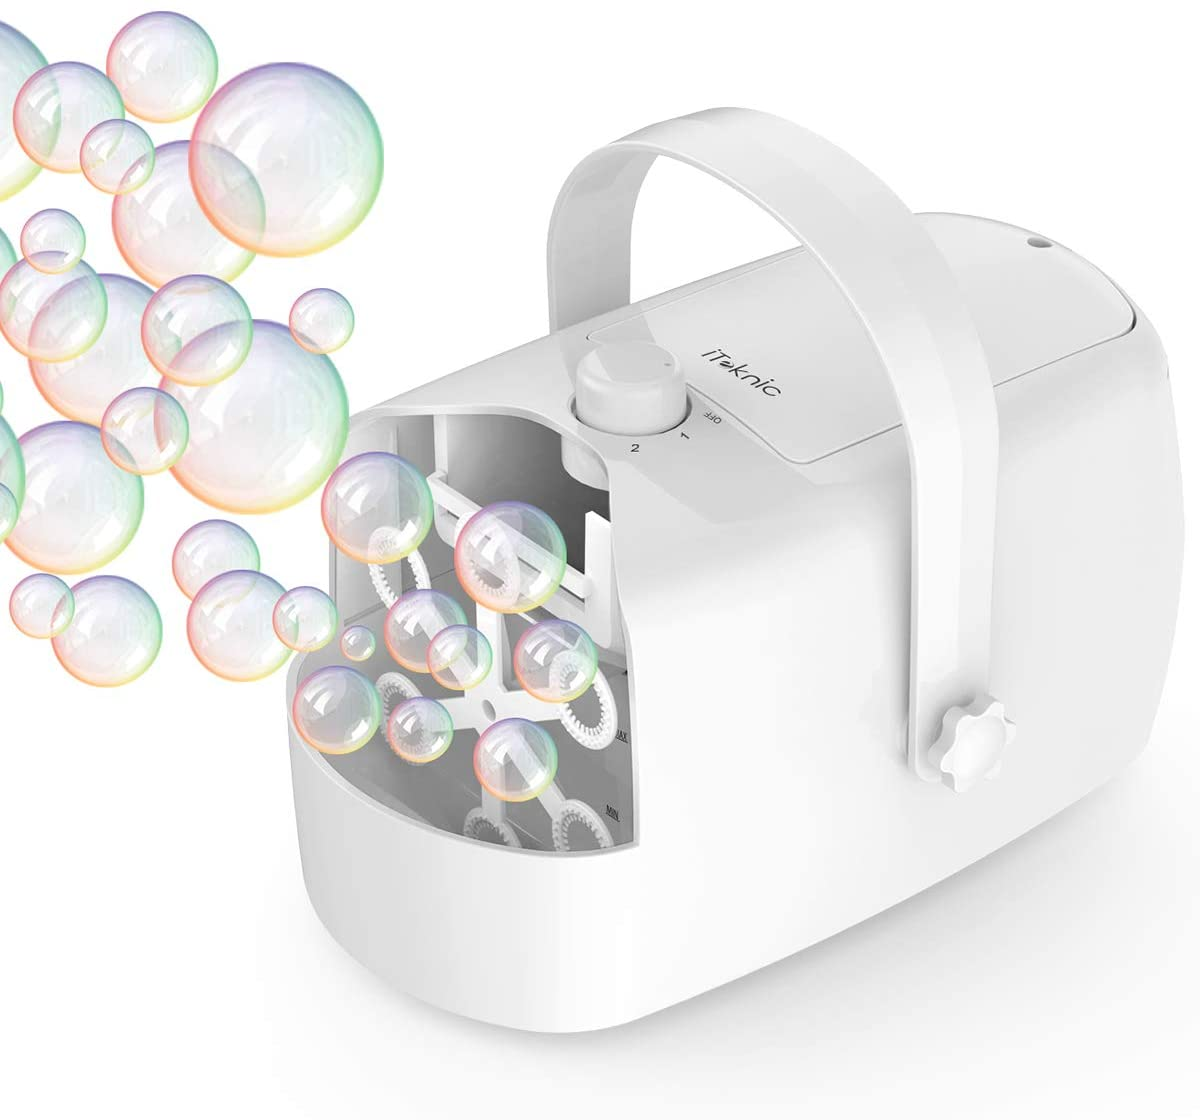 Automatic Bubble Blower